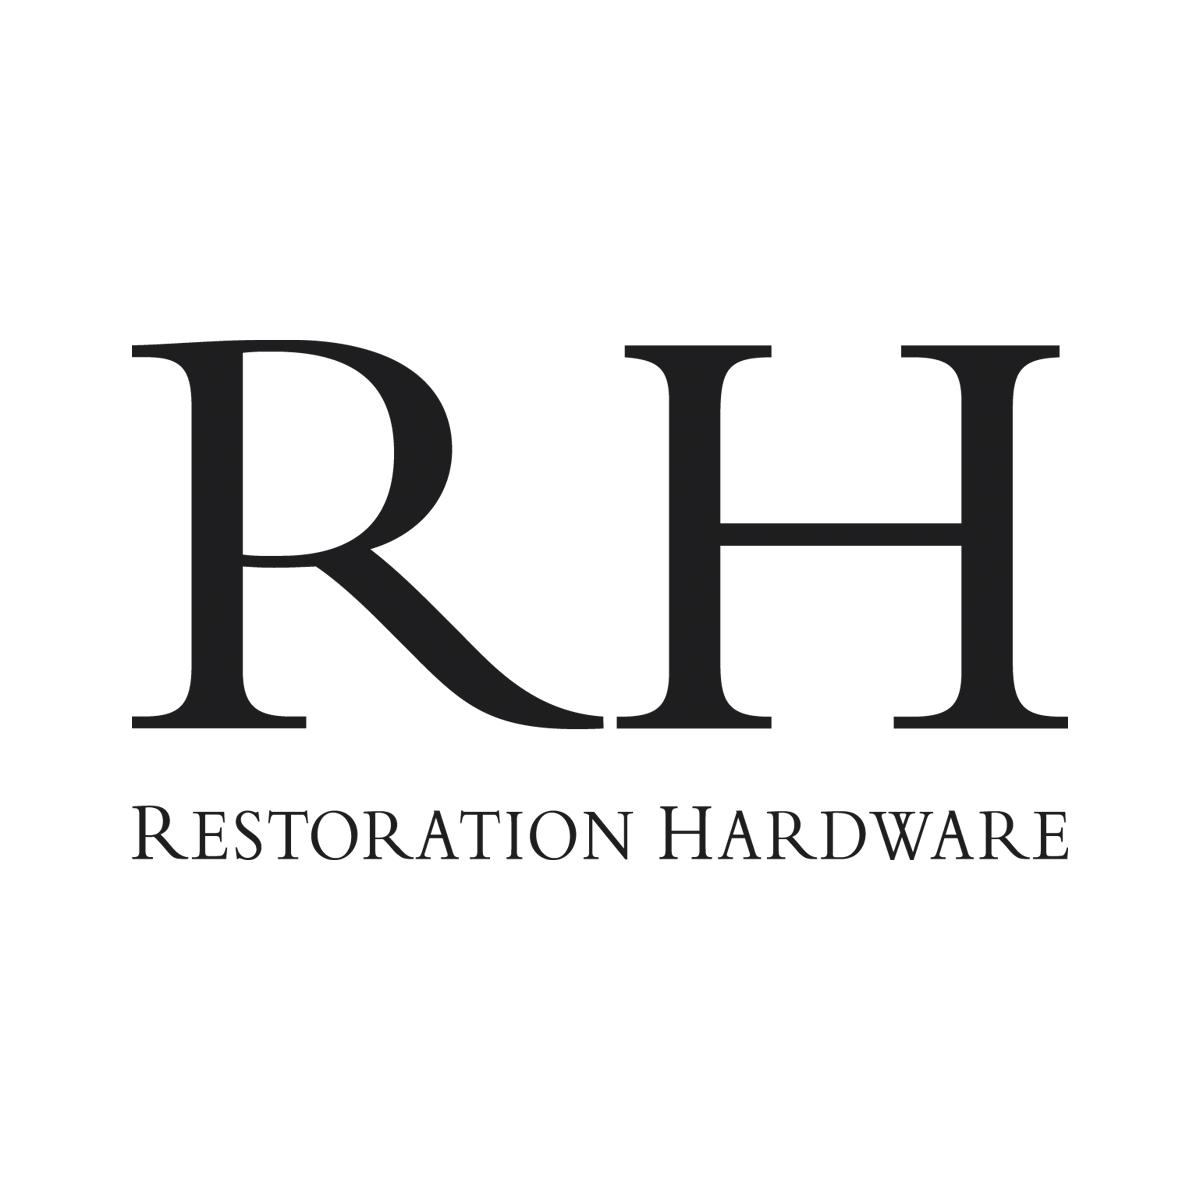 Restoration-Hardware.jpg